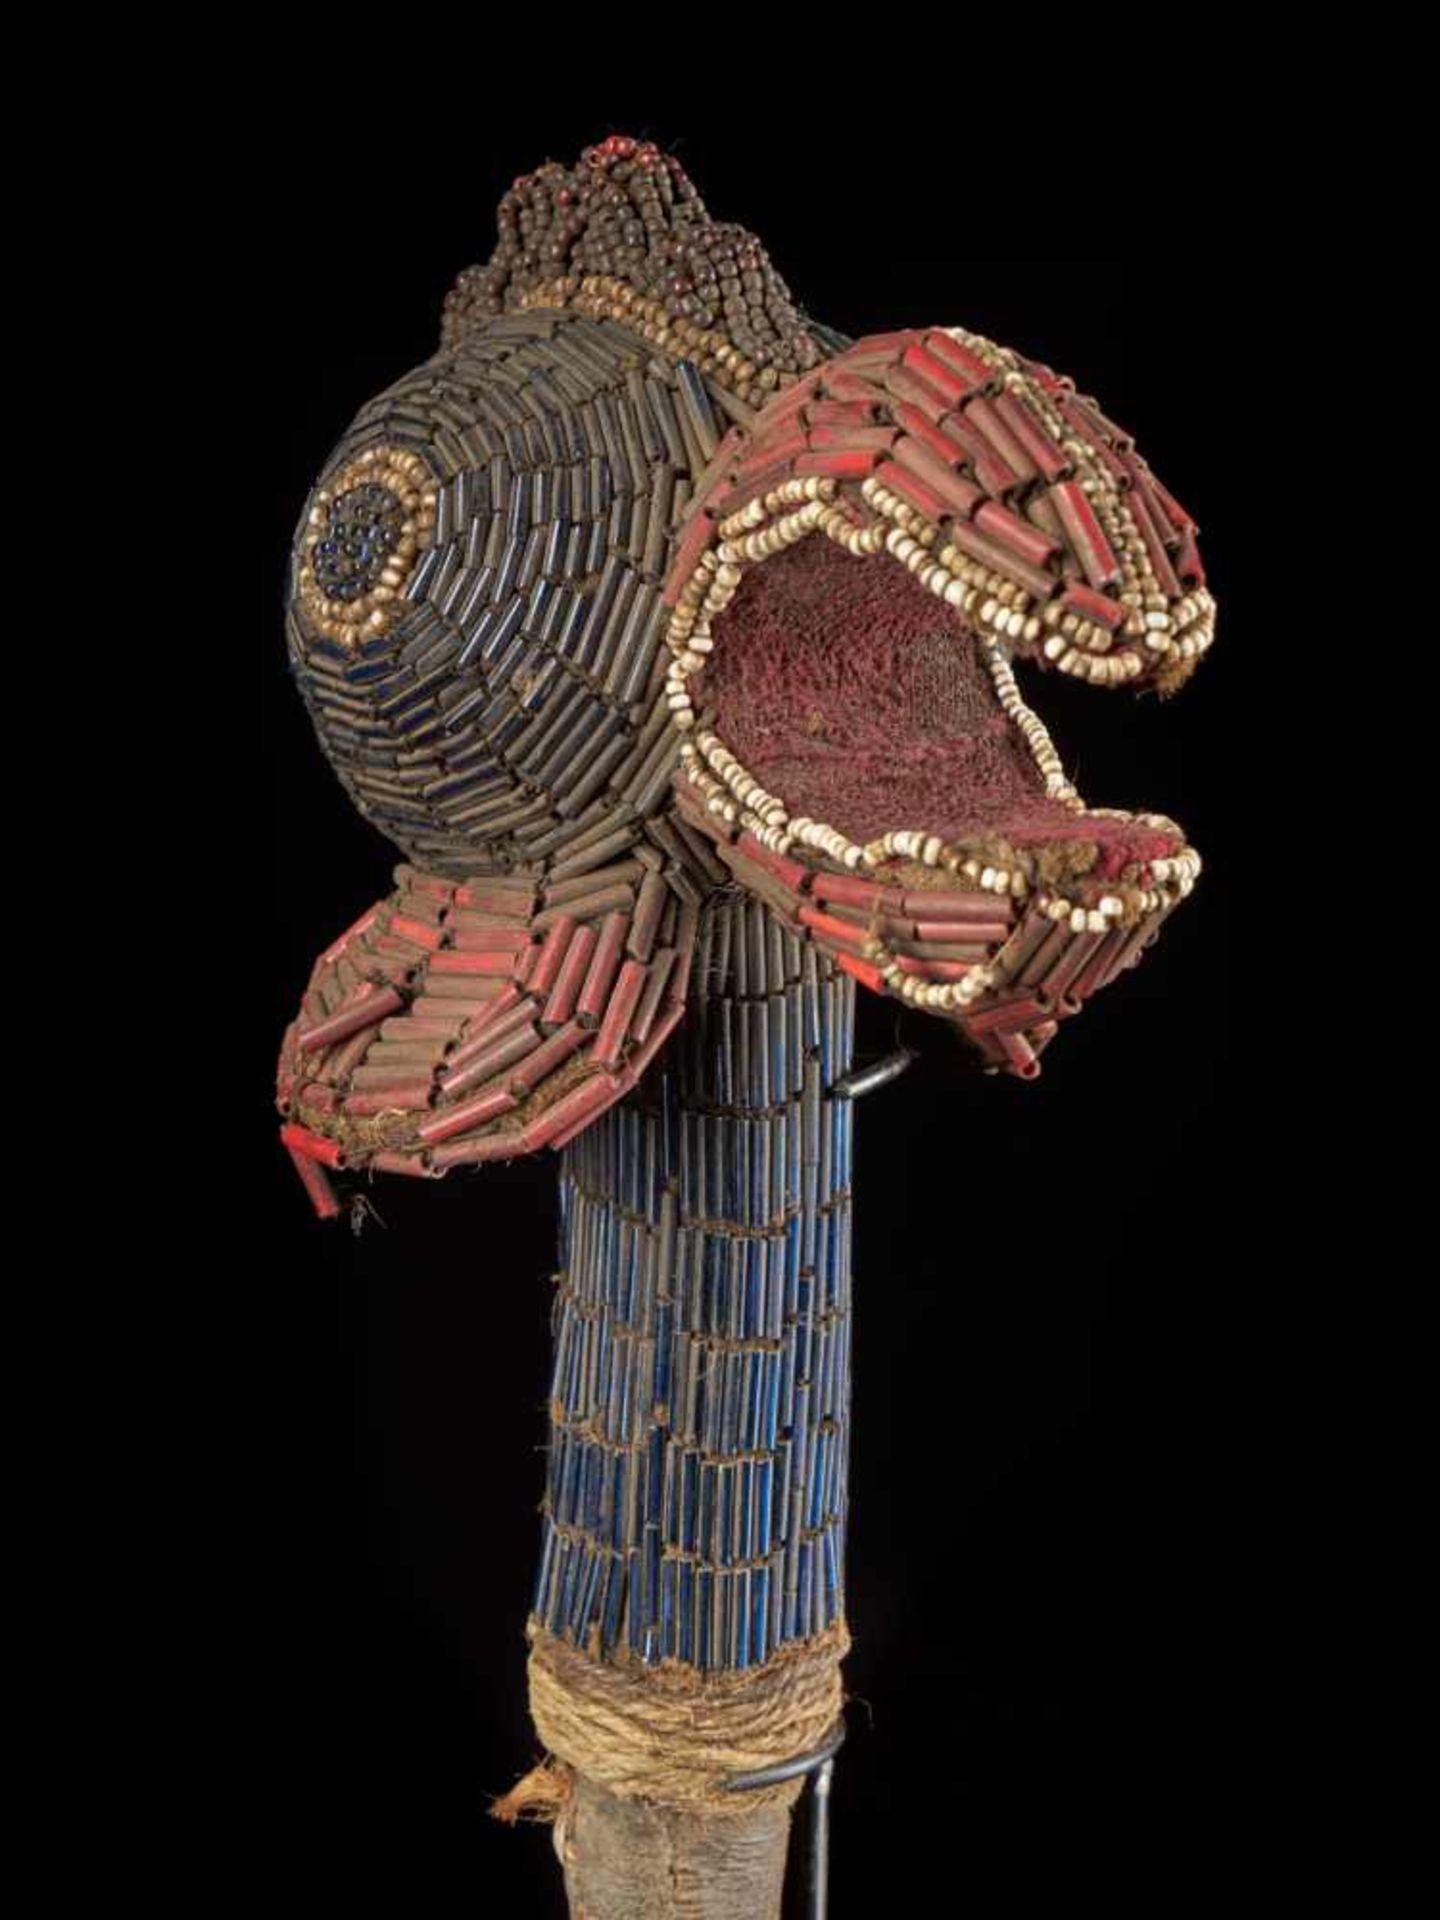 Beaded Flywhisk - Rooster - Tribal ArtThe Royal Fly Whisks (ethnic names: see leng koko or beuka) - Bild 5 aus 8